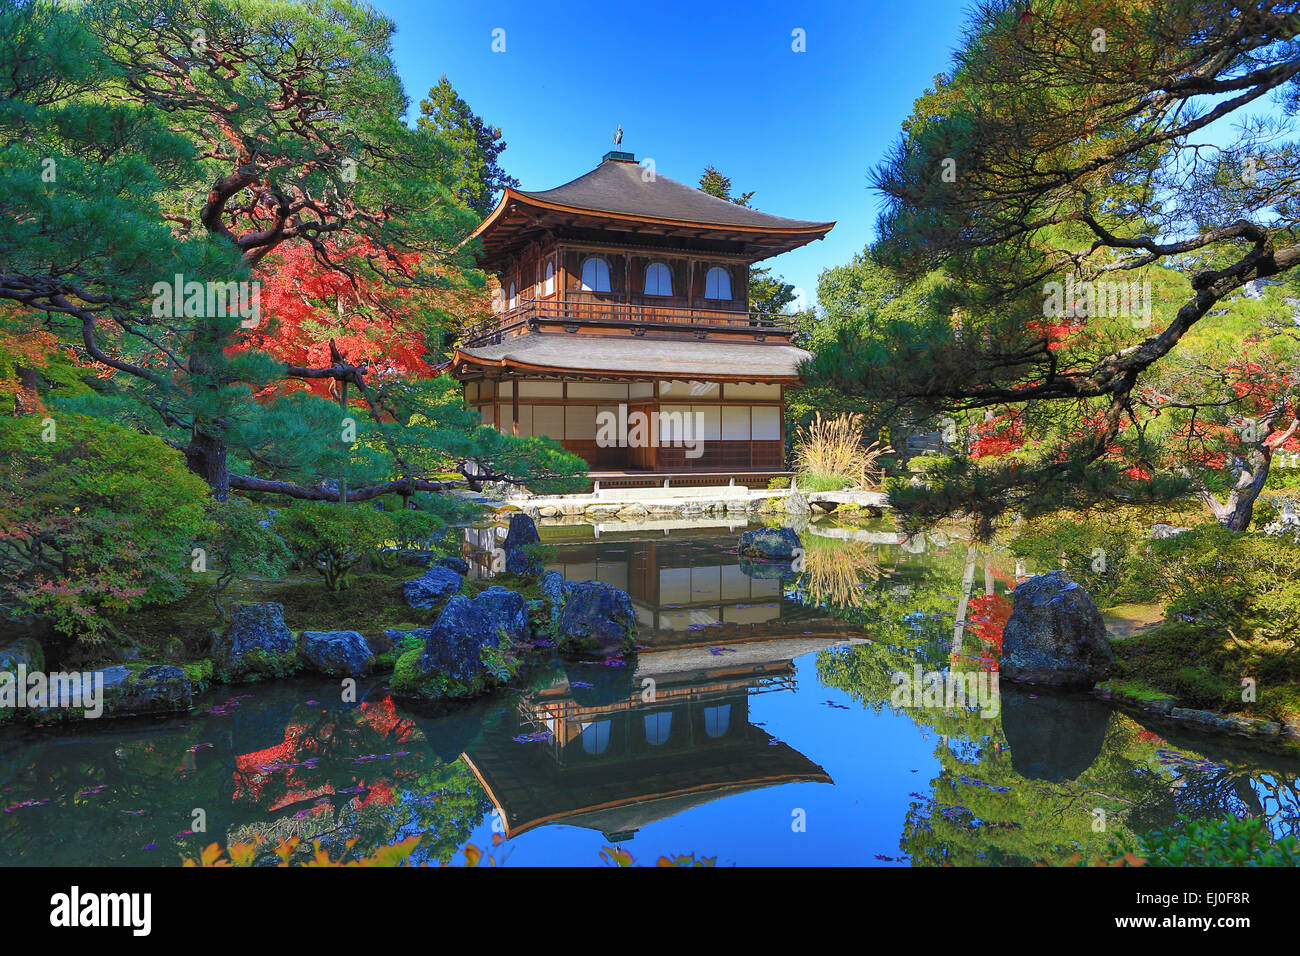 Welterbe, Ginkaku-Ji, Japan, Asien, Kansai, Kyoto, Japan, Landschaft, Architektur, bunt, Herbst, Garten, Haus, Momiji Stockbild